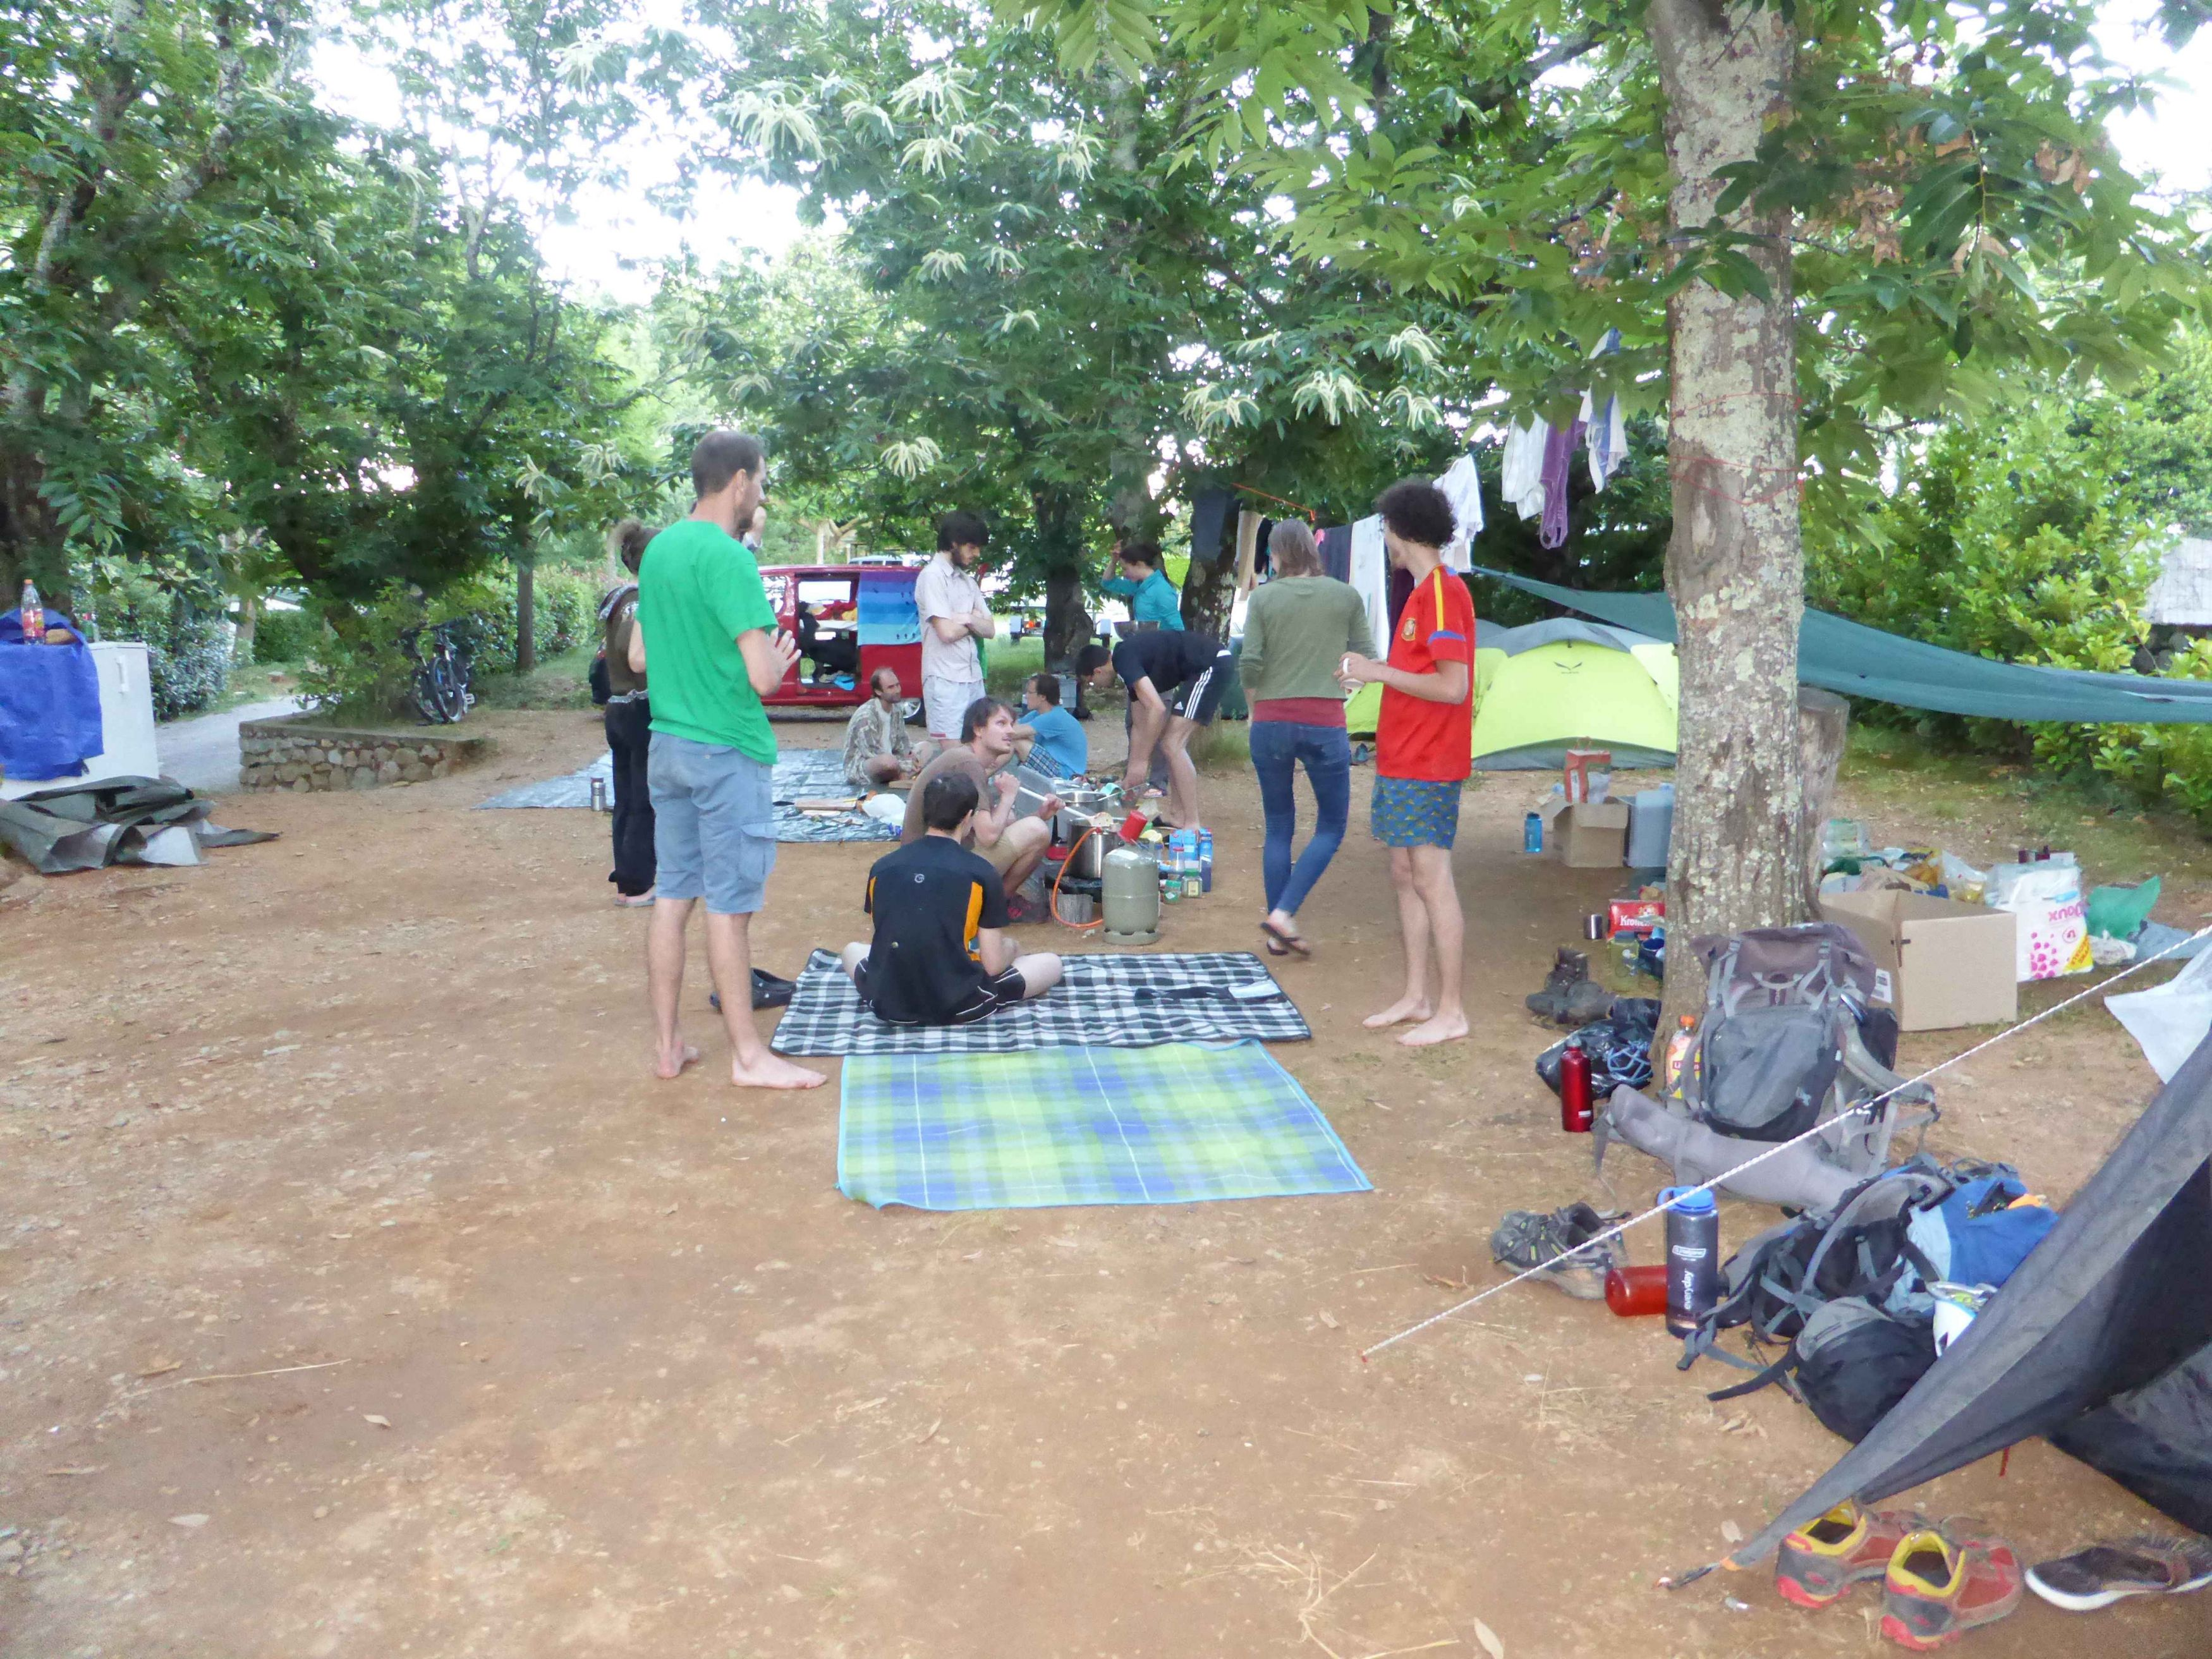 Die Profi-Camping-Küche in Aktion (Foto: Svenja Kremer)